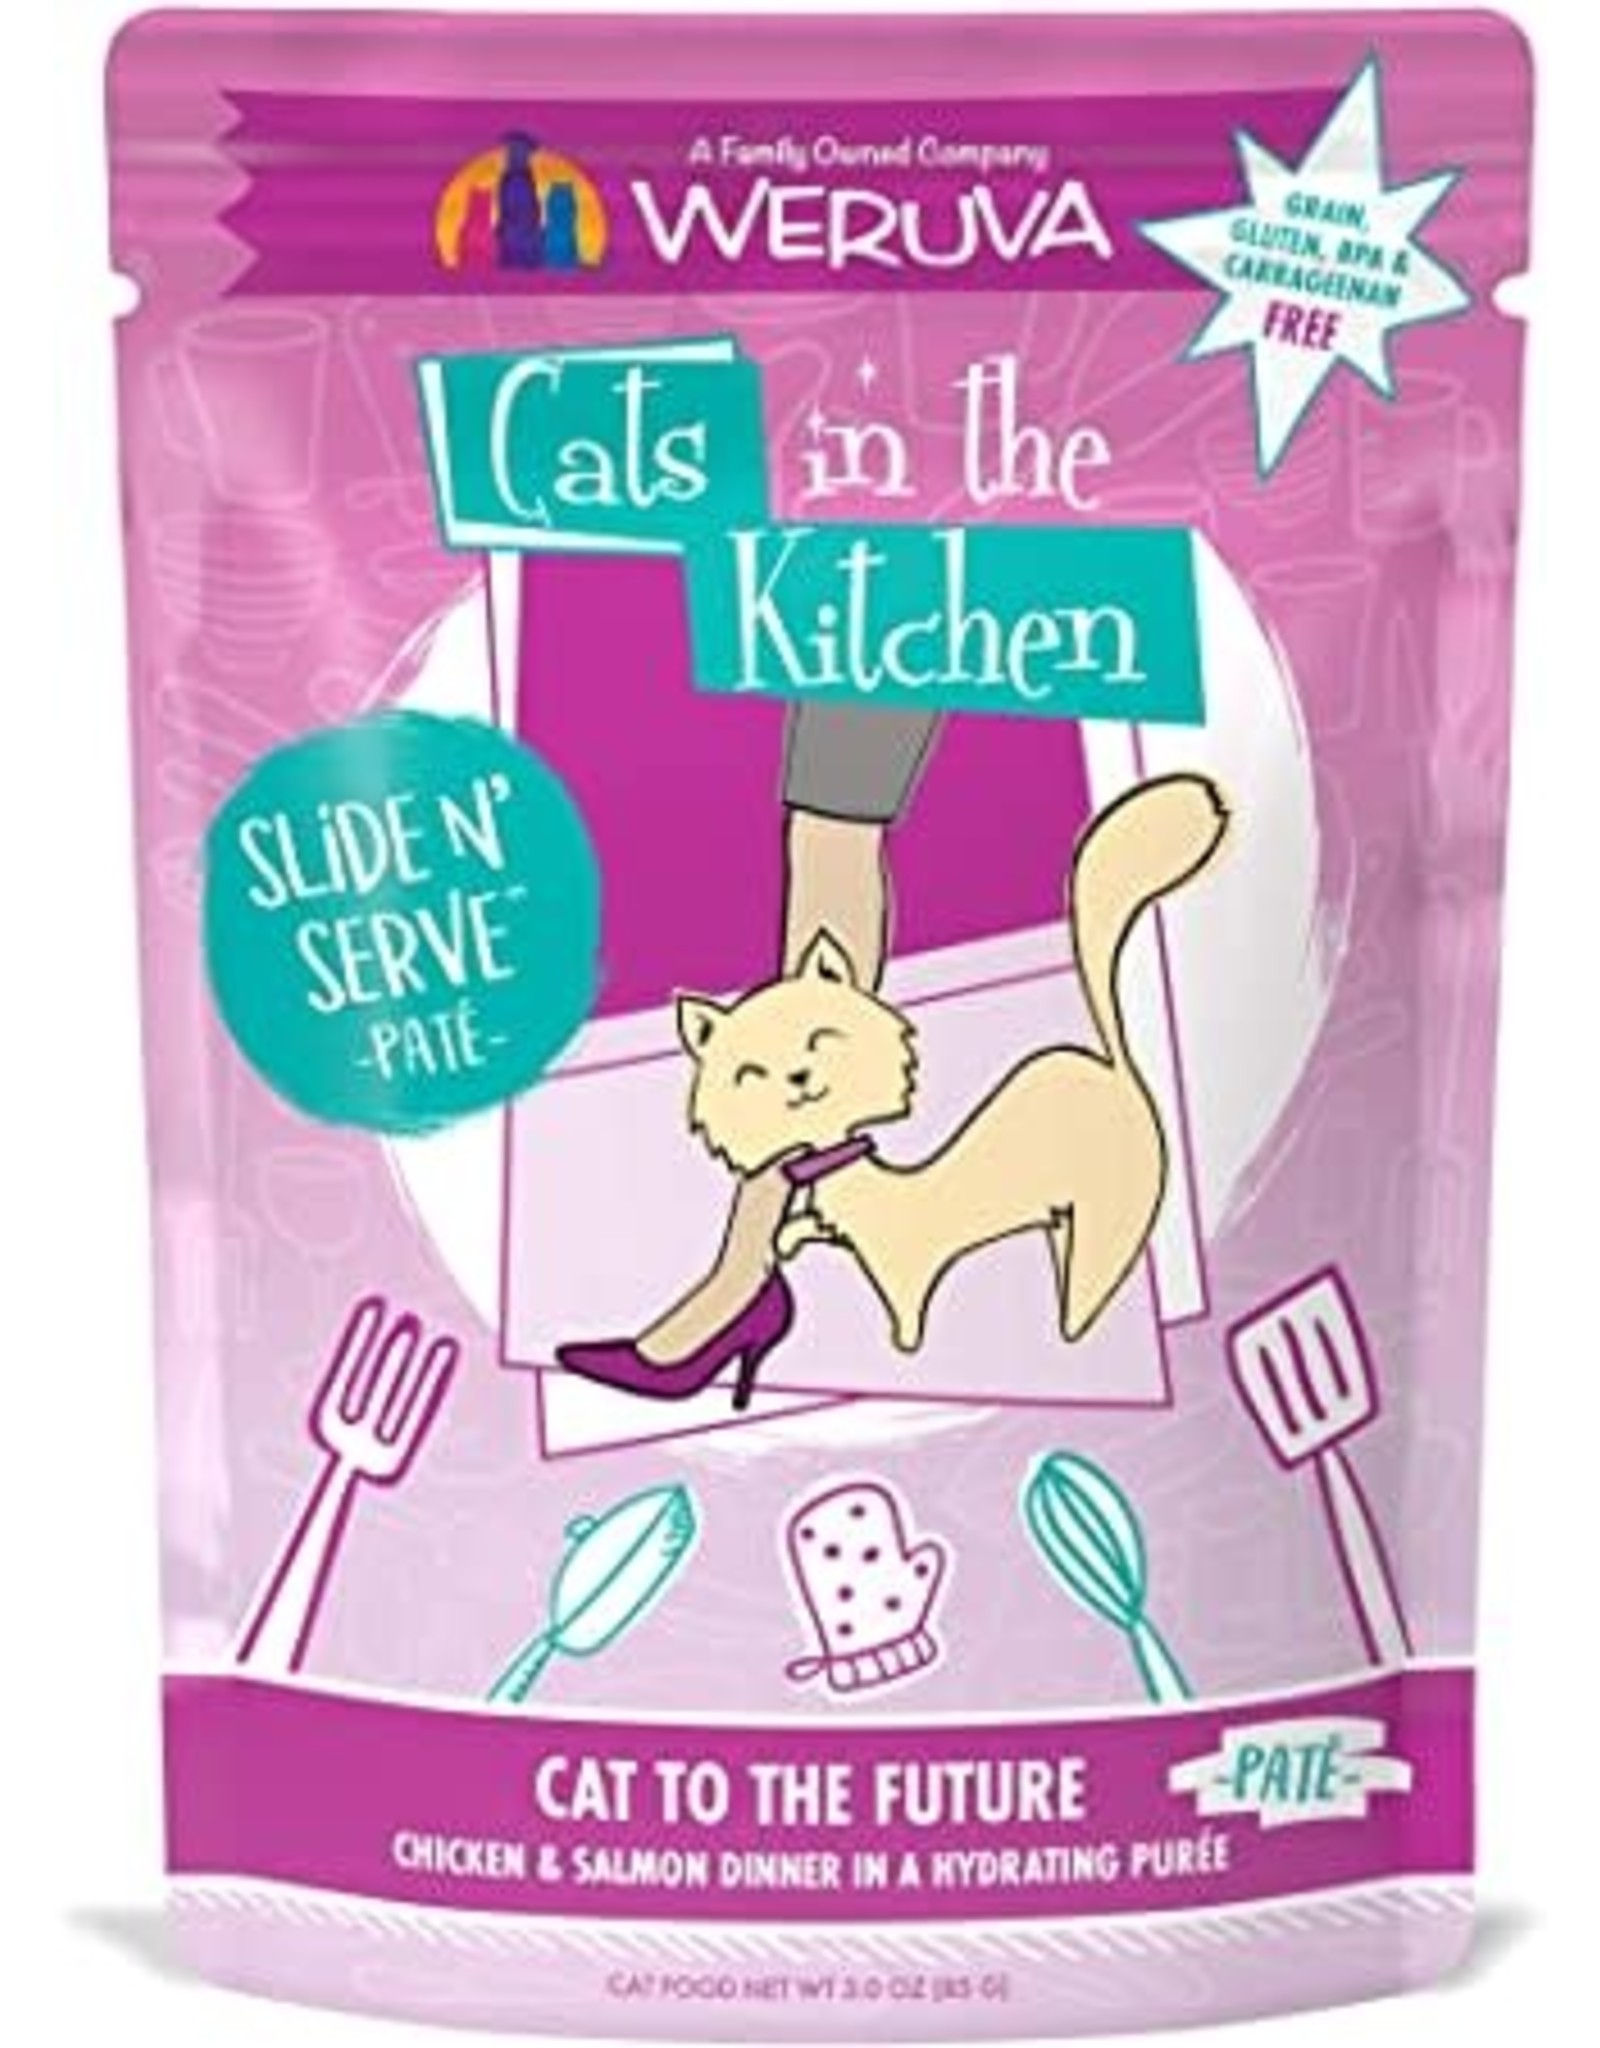 Weruva CITK Pouch - CAT TO THE FUTURE Chicken/Salmon pate 3oz